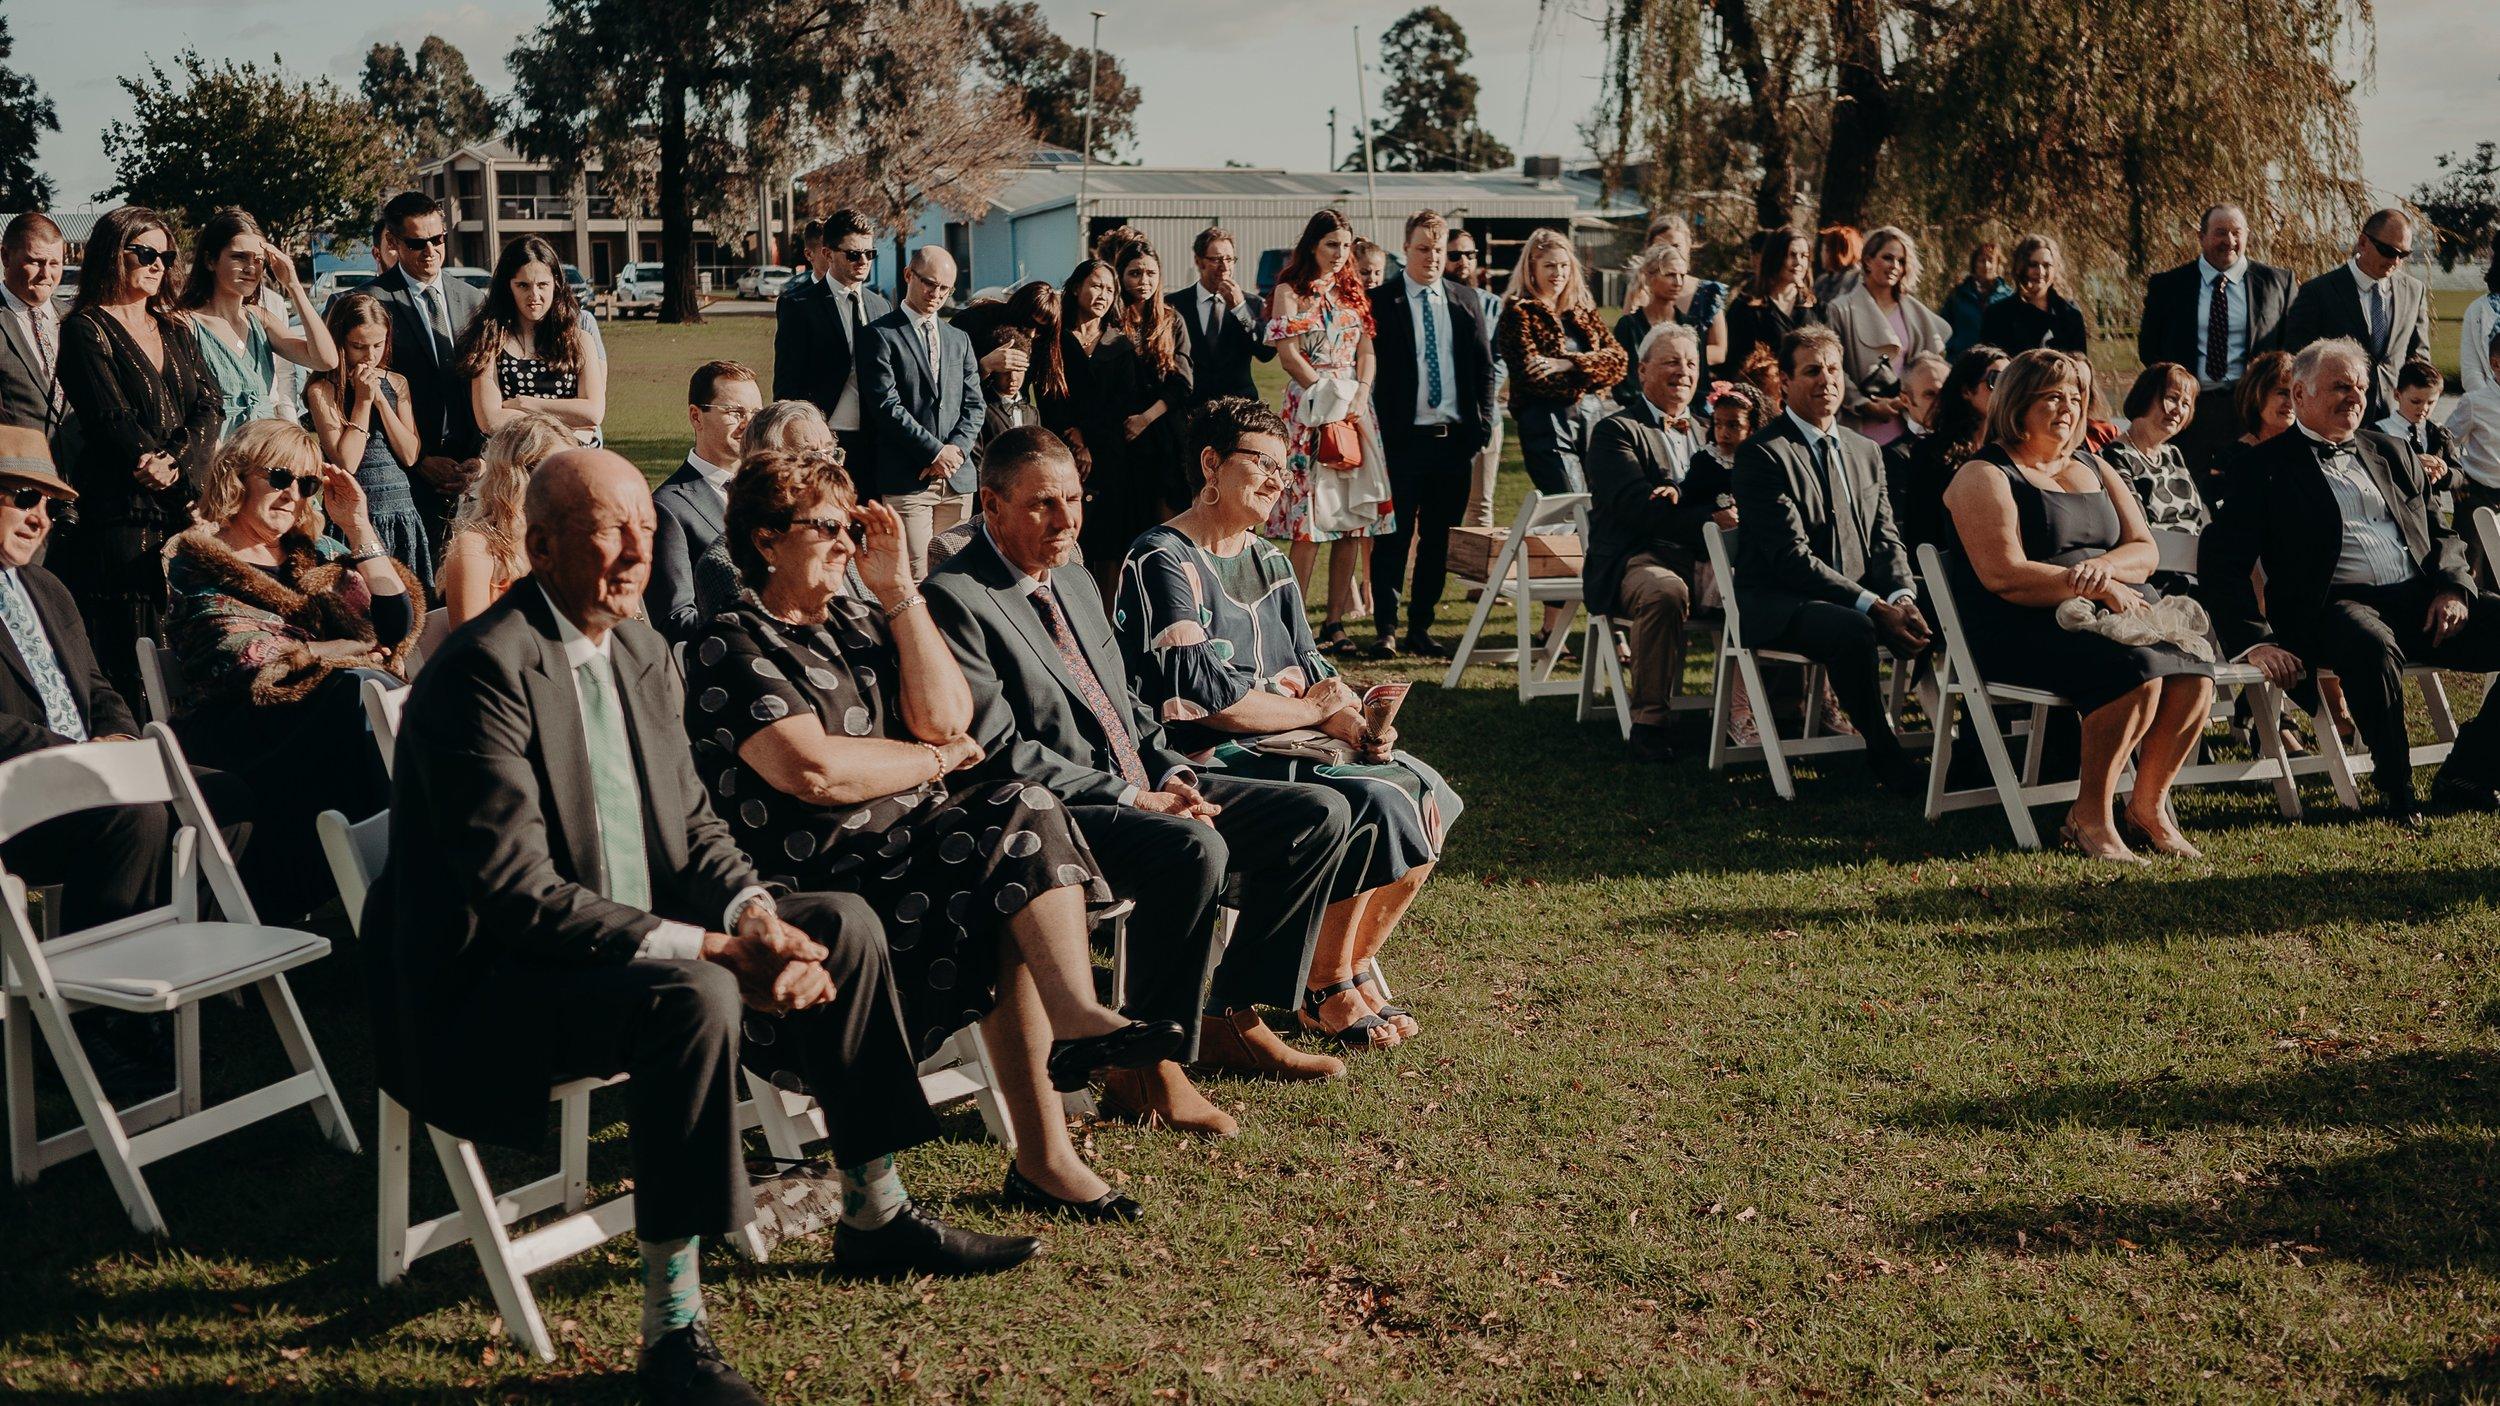 mickalathomas_puremacphotography_weddingphotographer_couplephotographer_Sheppartonphotographer_2539.jpg